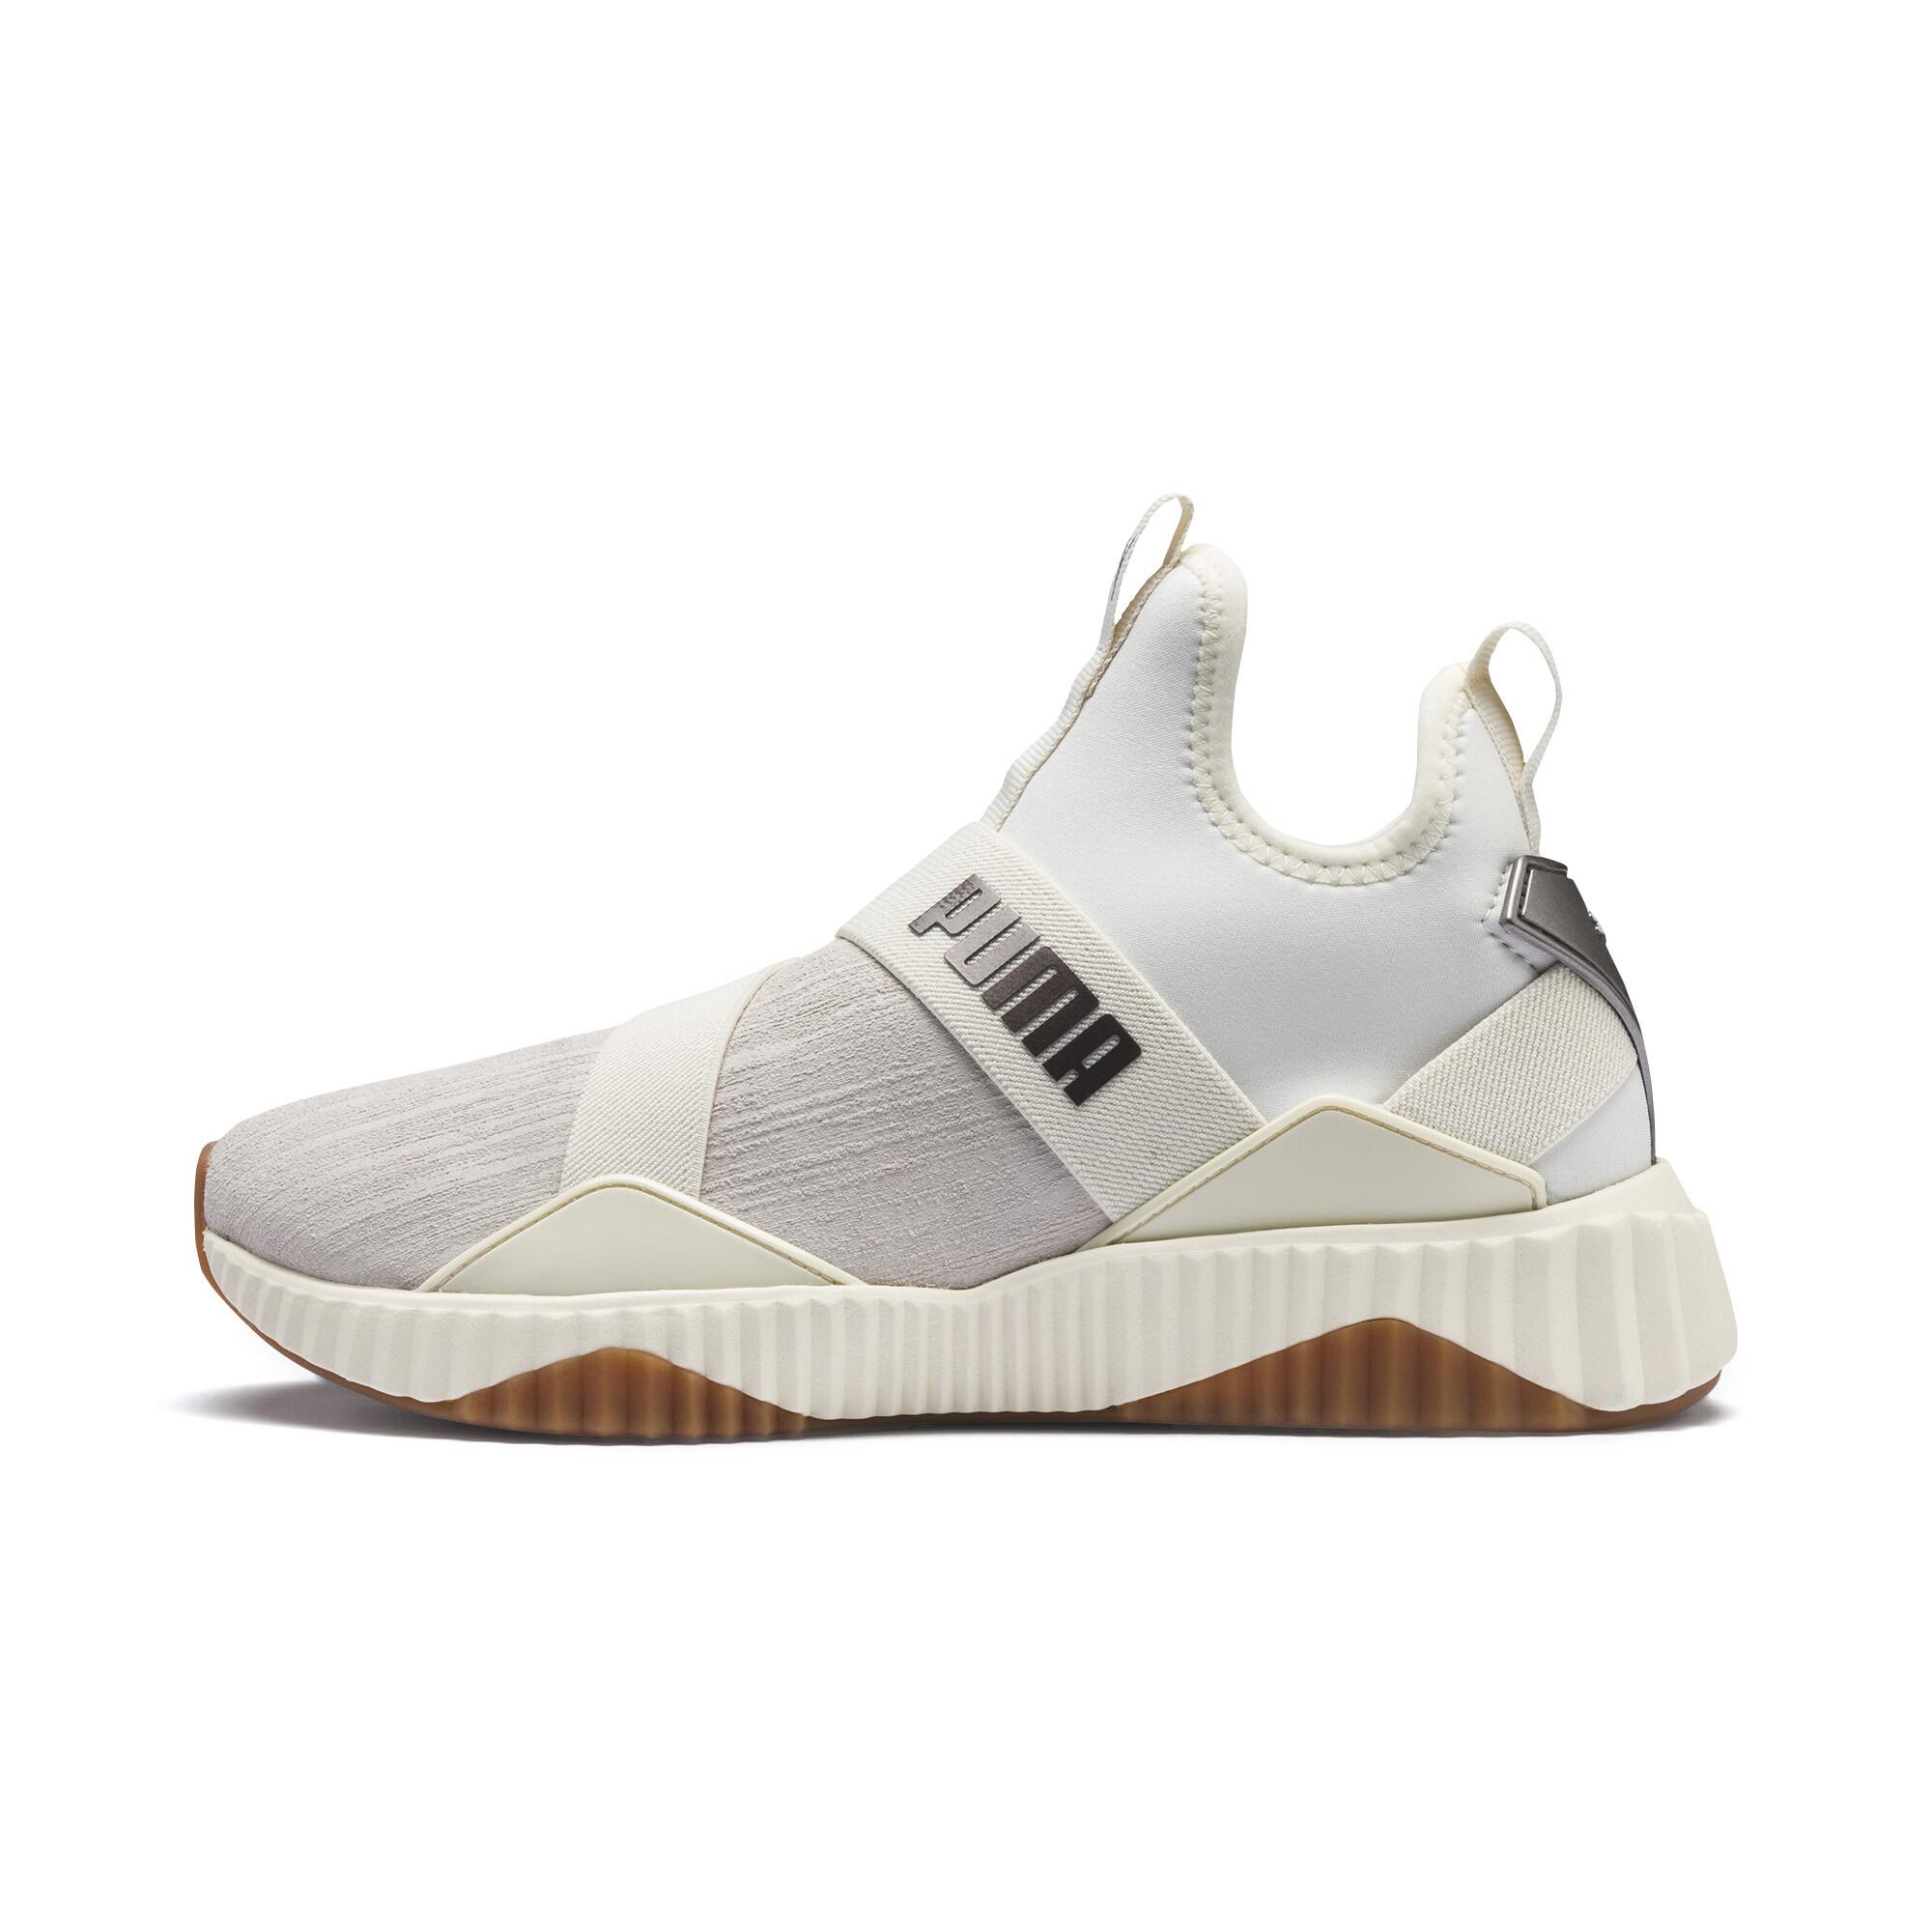 Image Puma Defy Luxe Mid Women's Sneakers #1